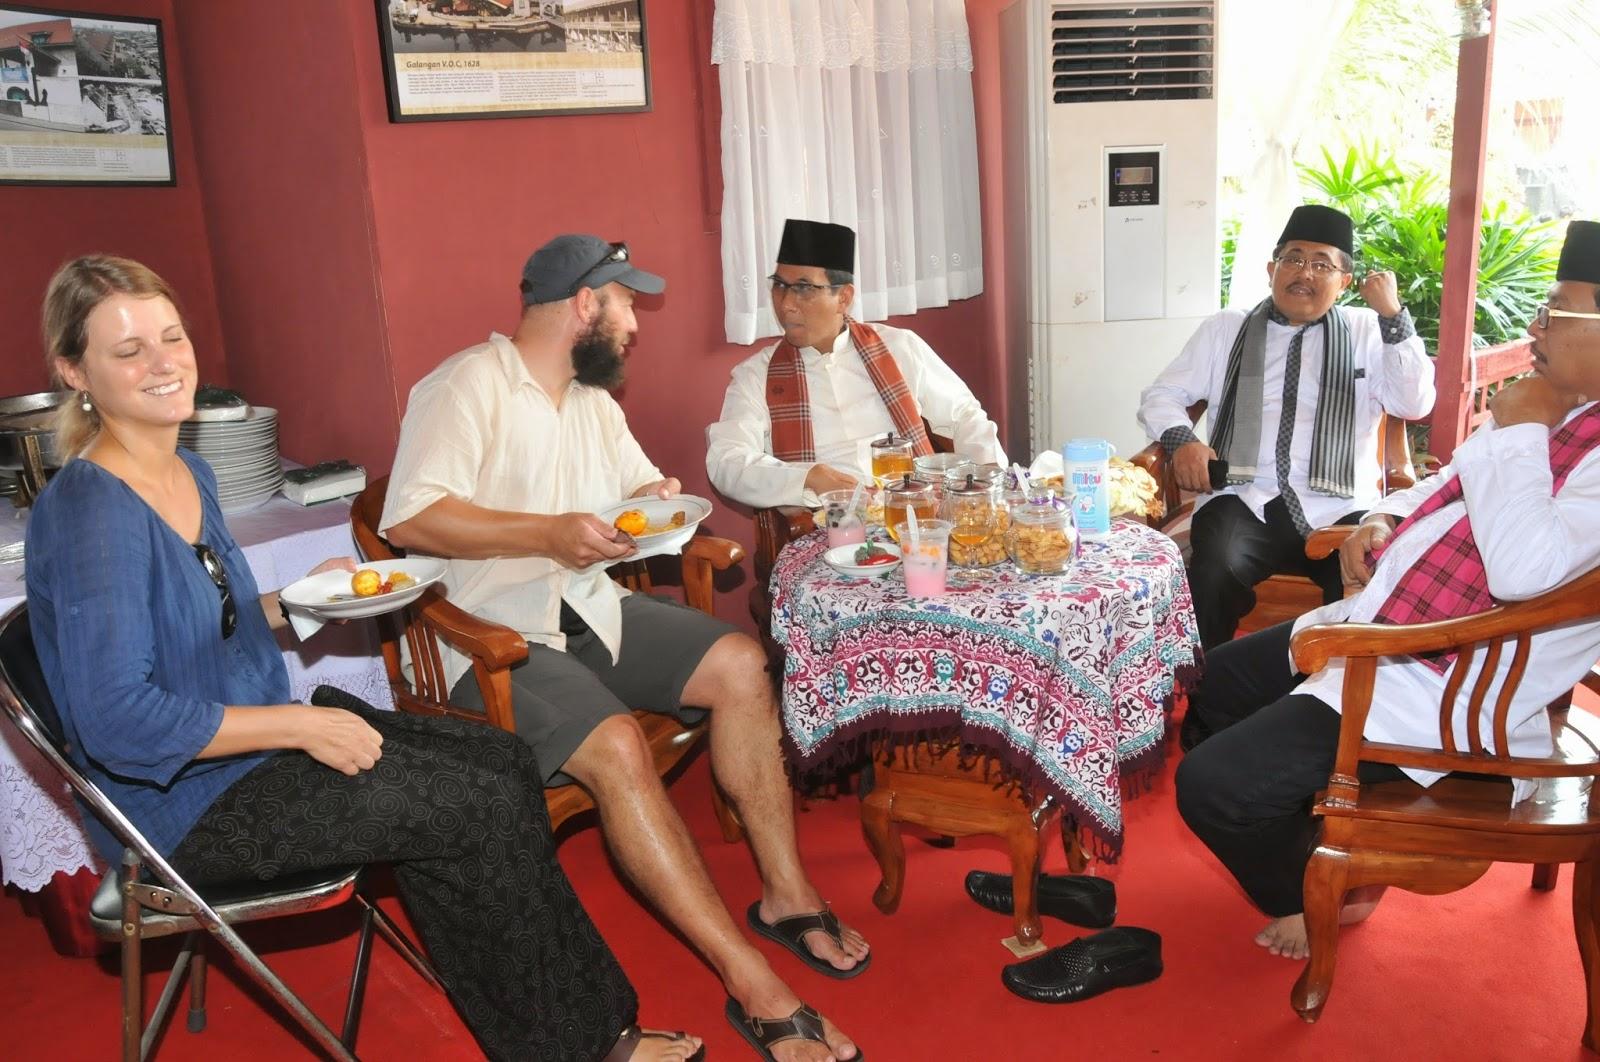 Walikota Jakarta Utara Heru Budi Hartono Walikota Heru Budi Hartono